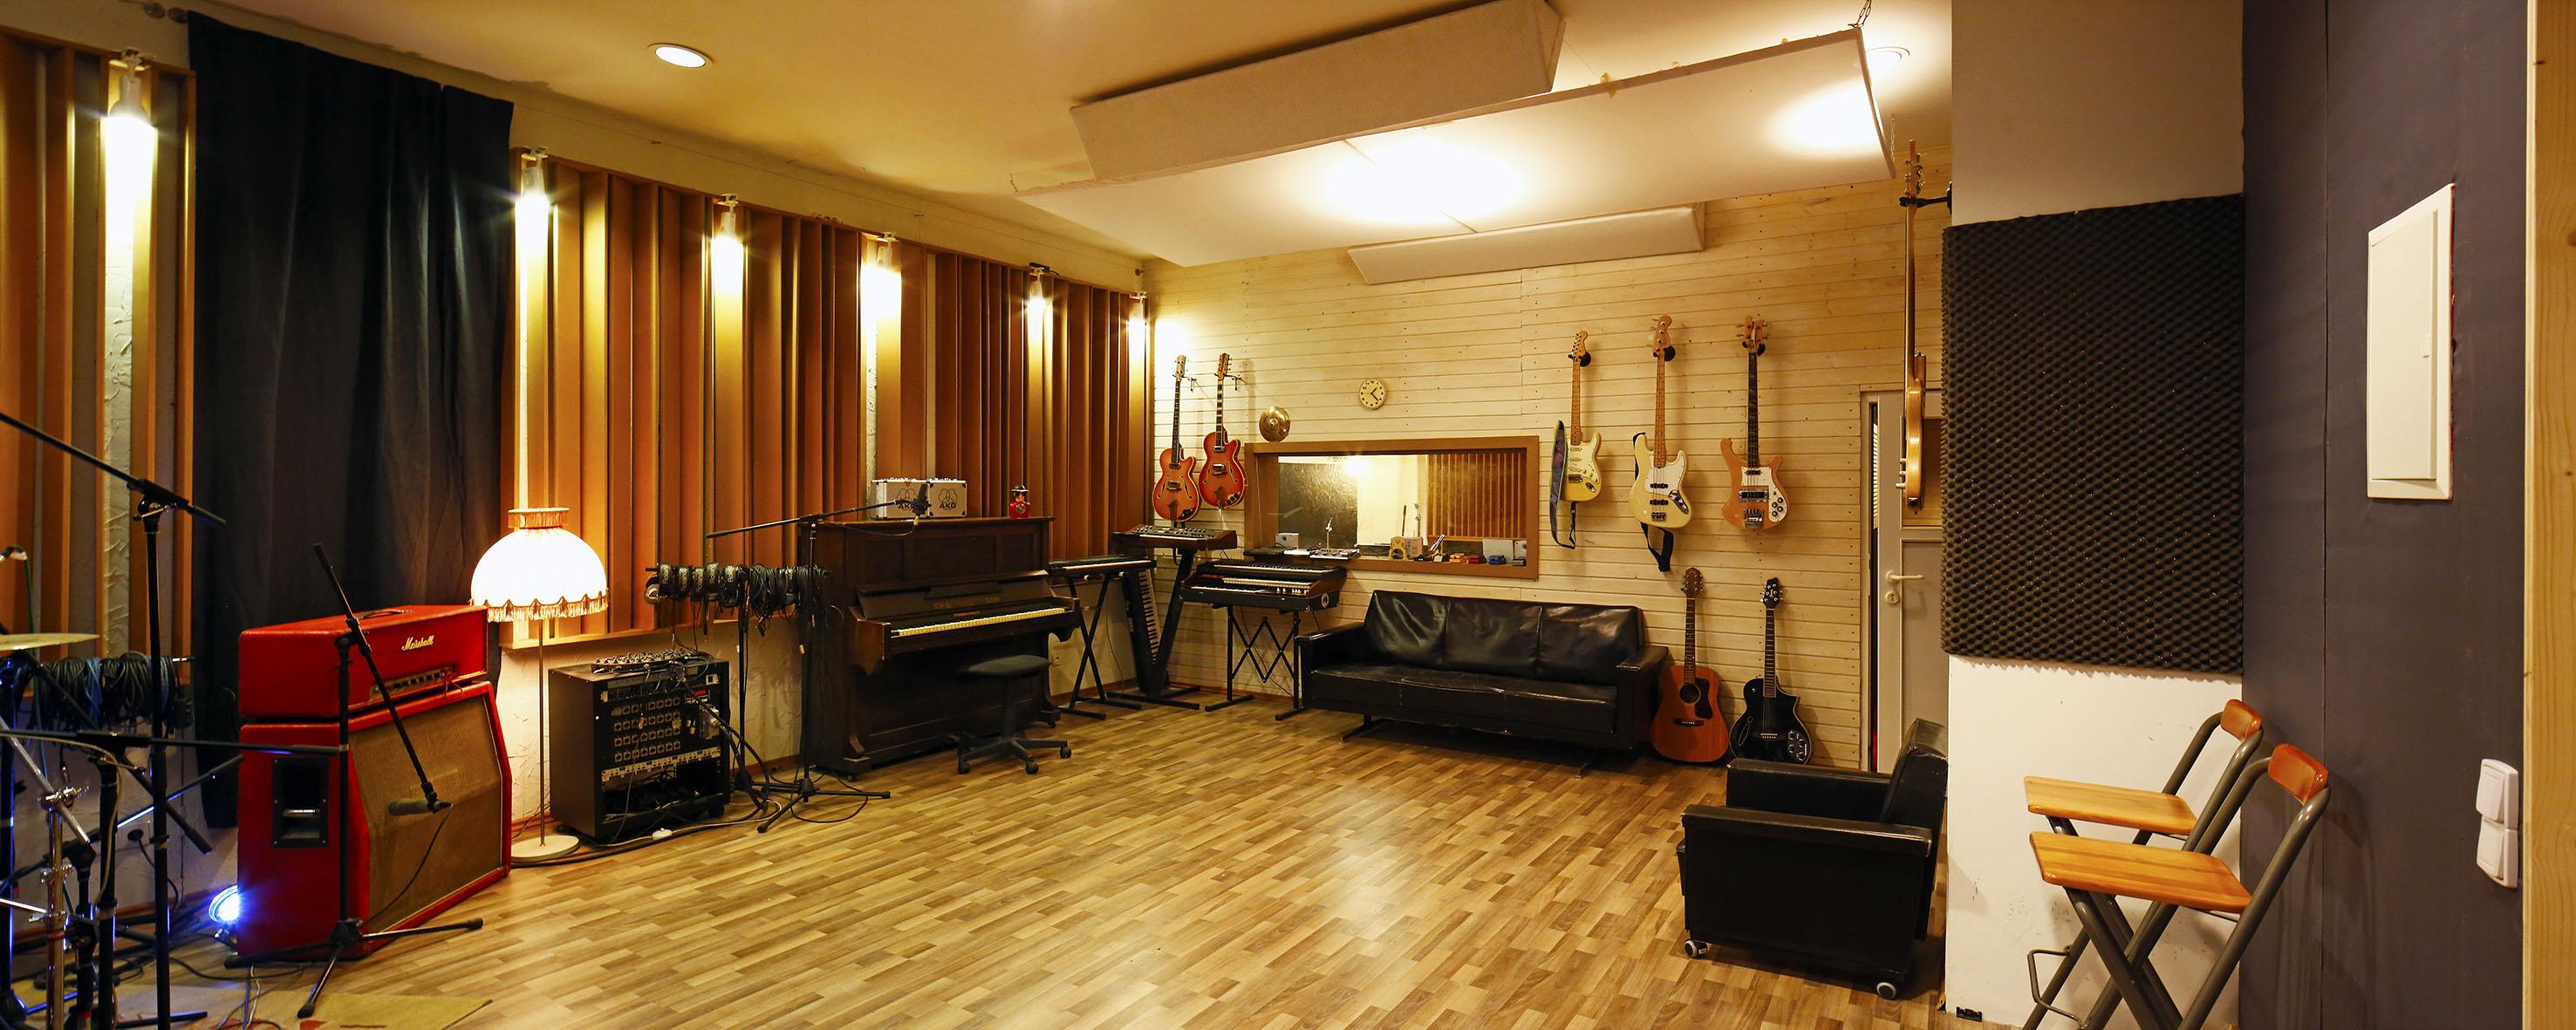 Studio 1 A.jpg